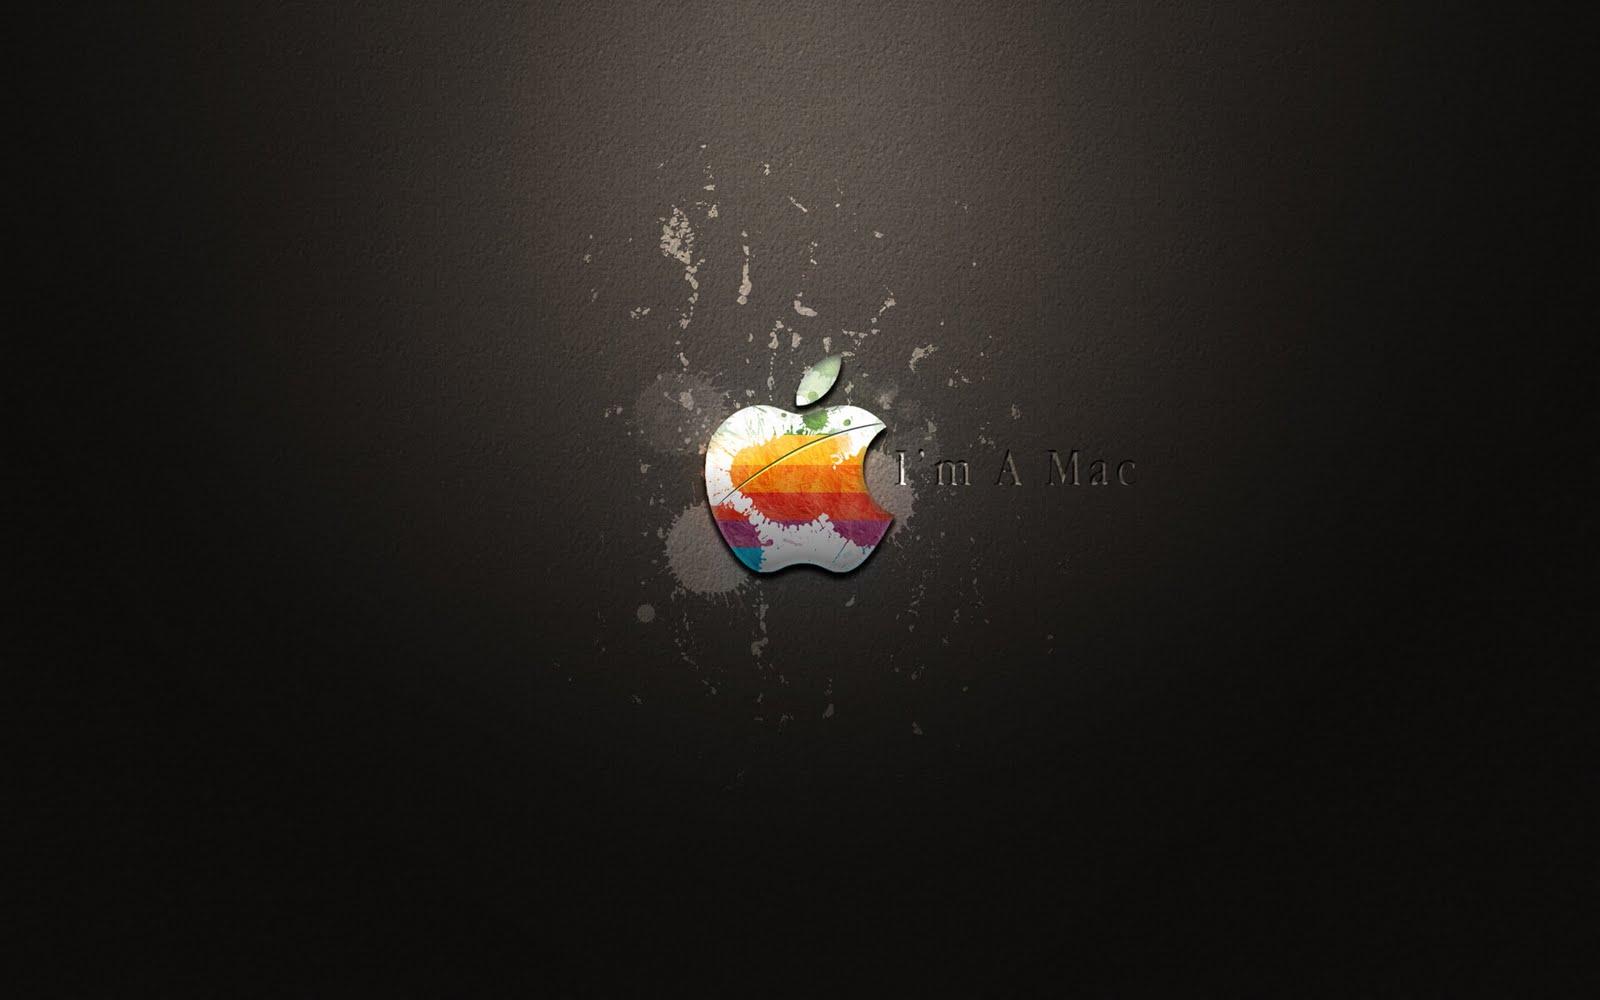 http://4.bp.blogspot.com/-nVUp0Ly_Uoo/Tf8Yr1UNMAI/AAAAAAAAIuo/z9a9OLj8sRo/s1600/Apple+Mac+Wallpaper.jpg